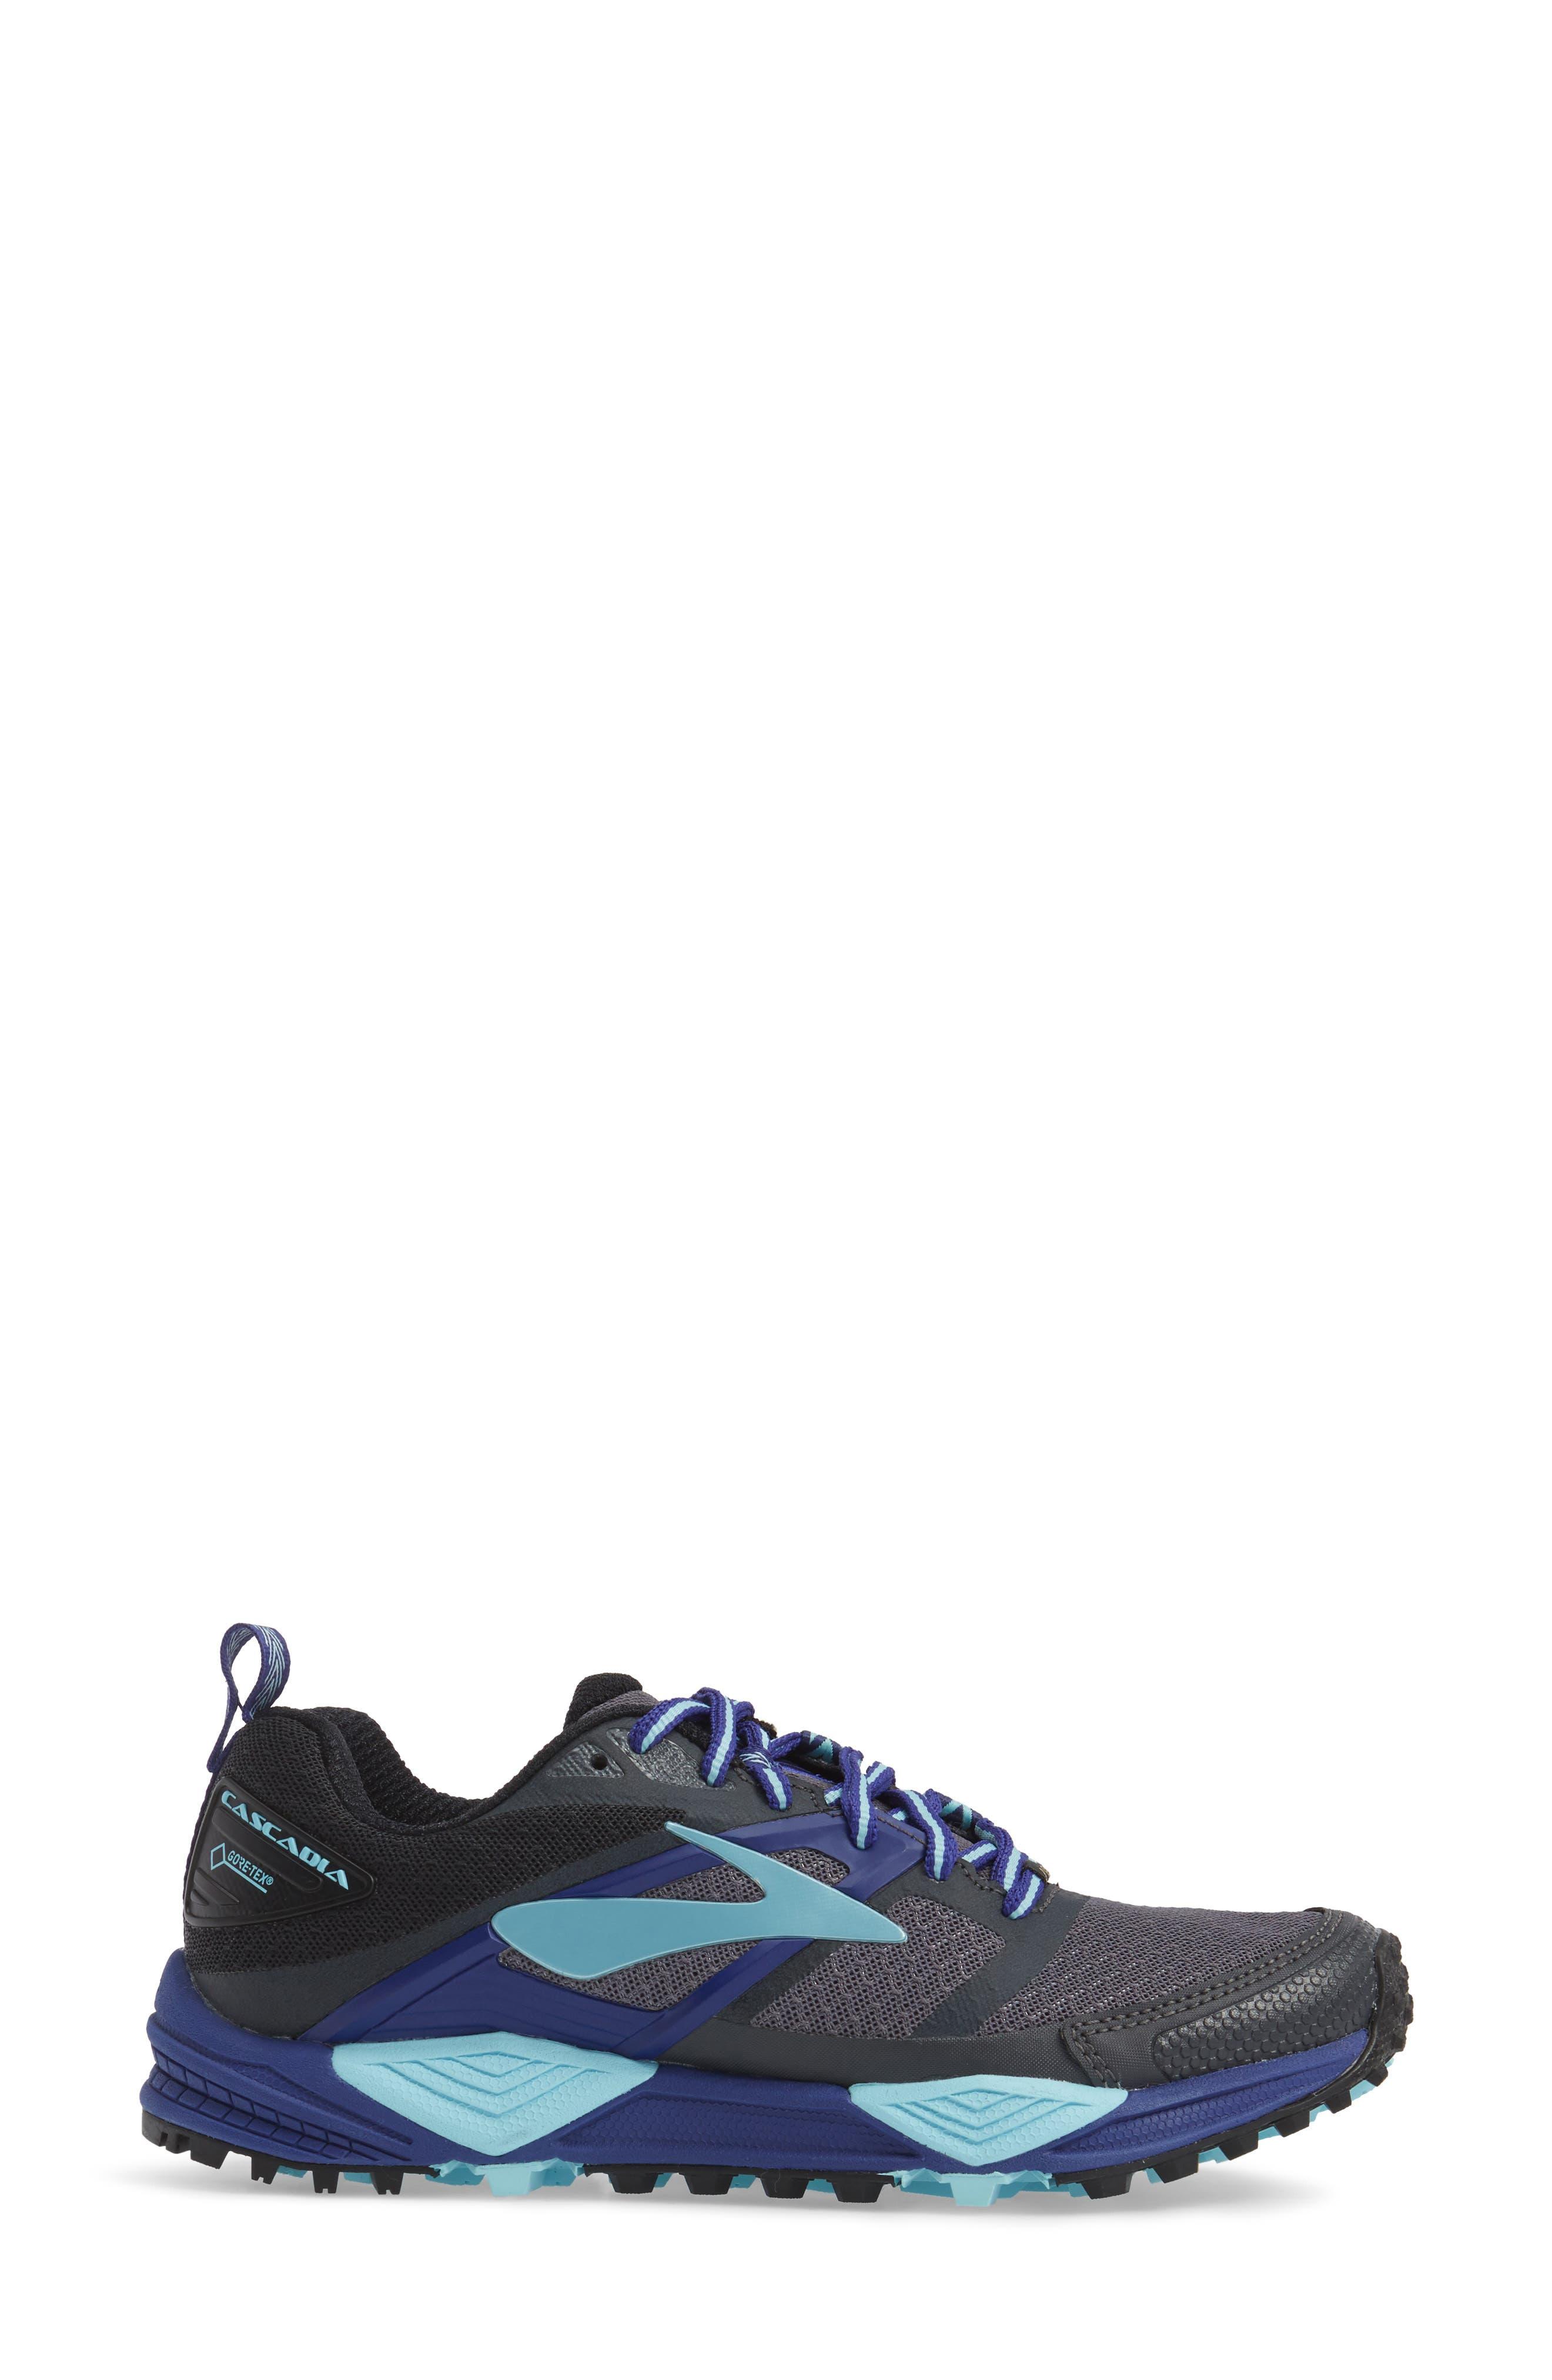 Alternate Image 3  - Brooks Cascadia 12 GTX Trail Running Shoe (Women)